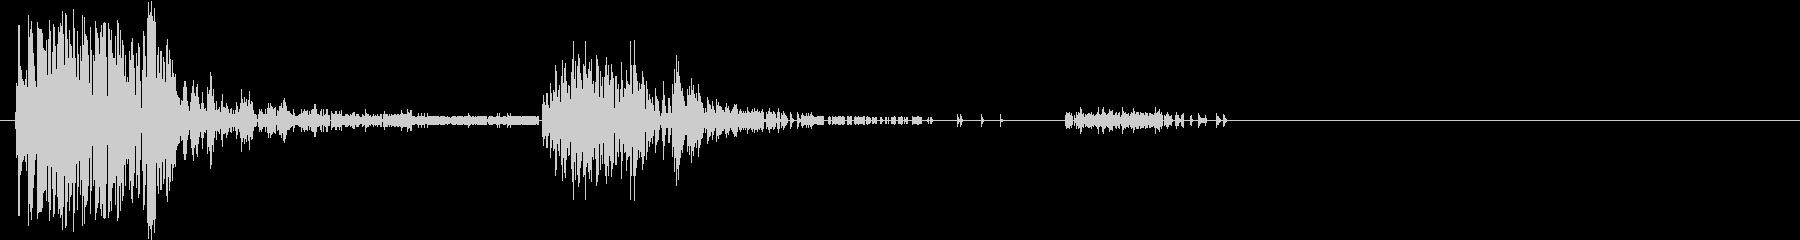 Noise デジタルノイズ 撃墜 大破の未再生の波形